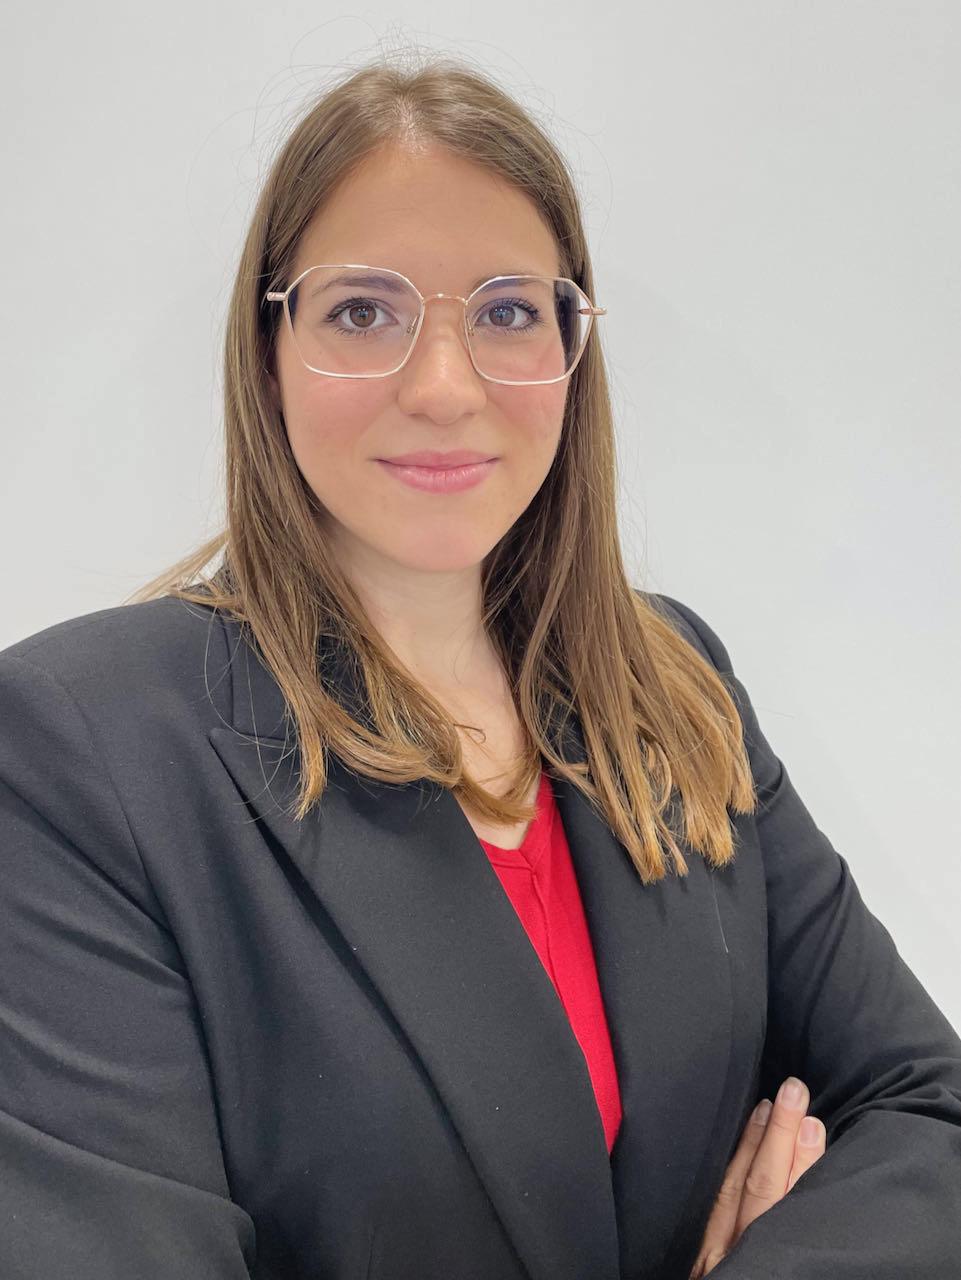 Sra. Laia Alfonso Moral